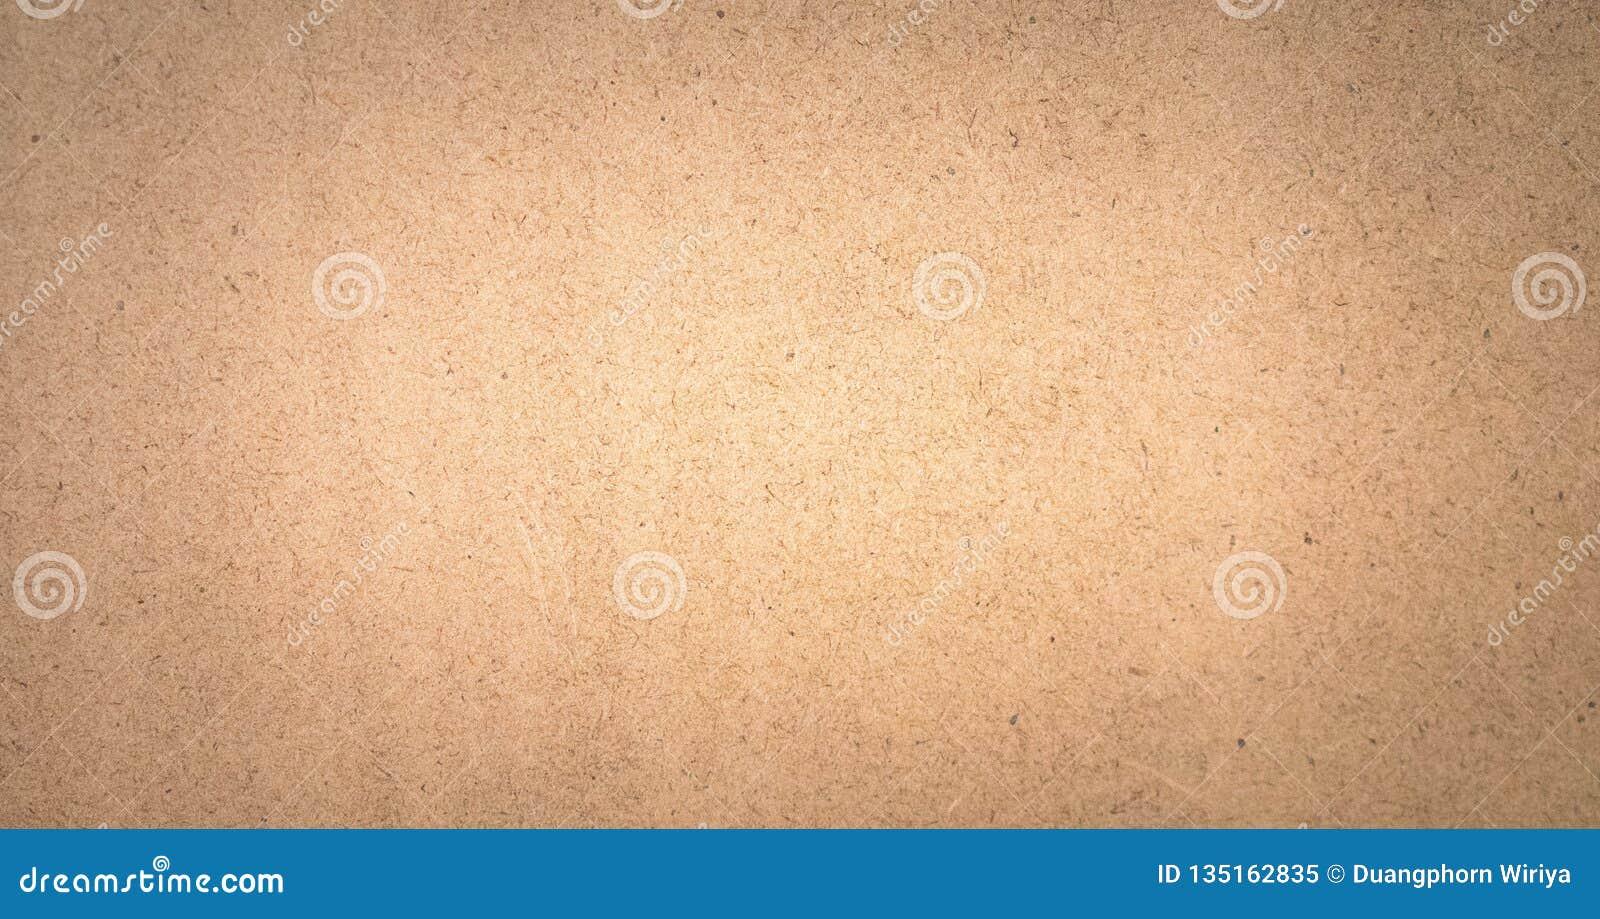 Corrugated paper box, Cardboard texture.